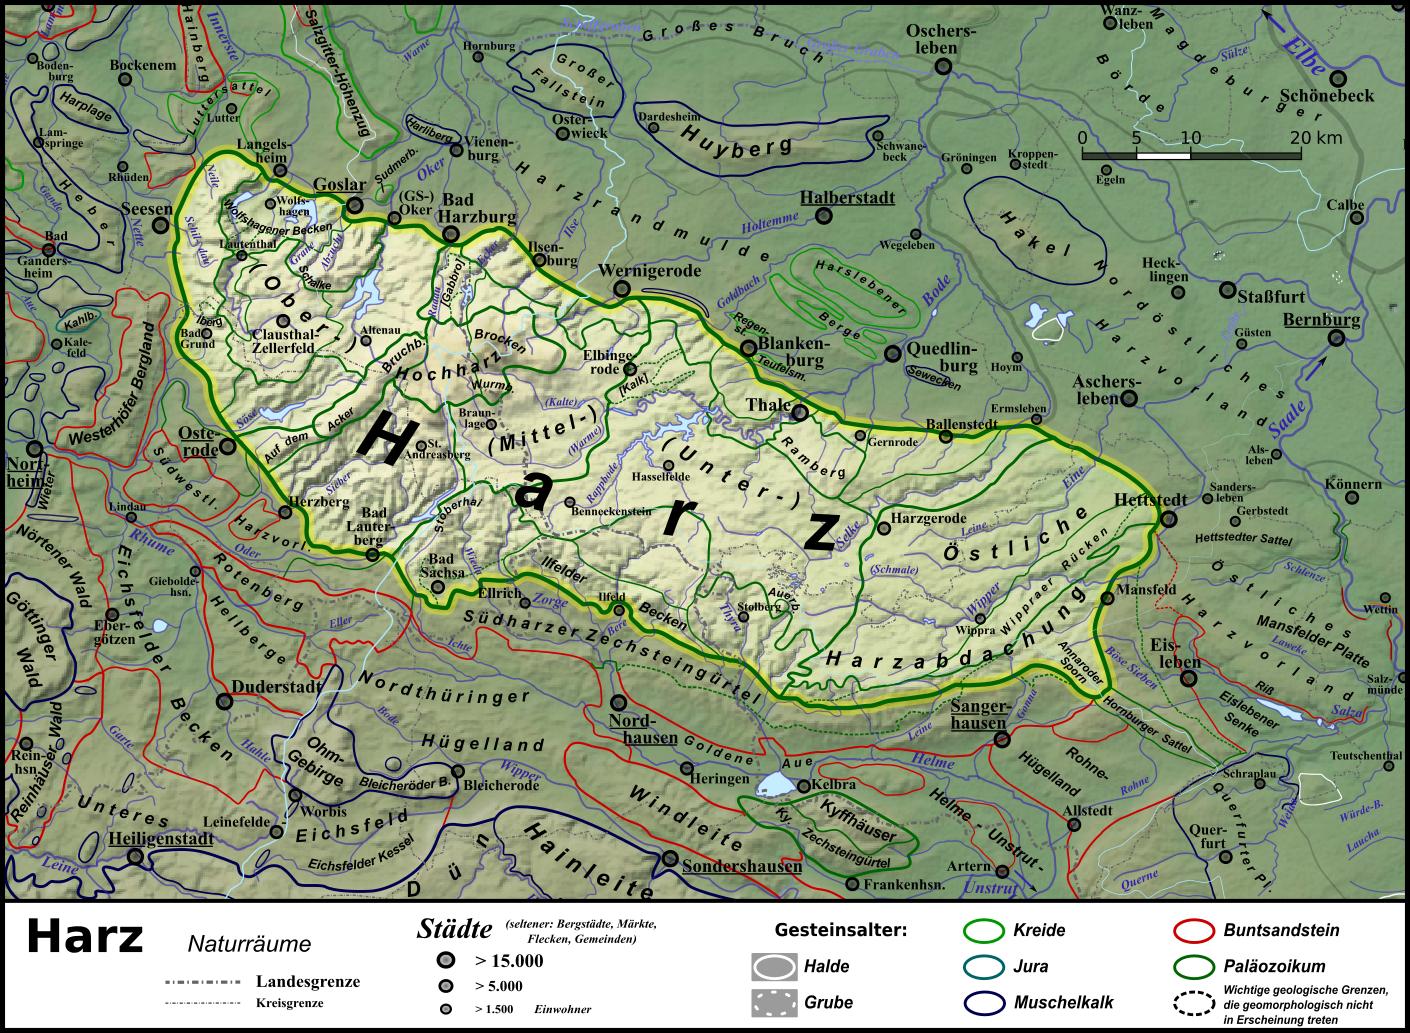 Mittelgebirge Deutschland Karte.Karte Deutsche Mittelgebirge Goudenelftal